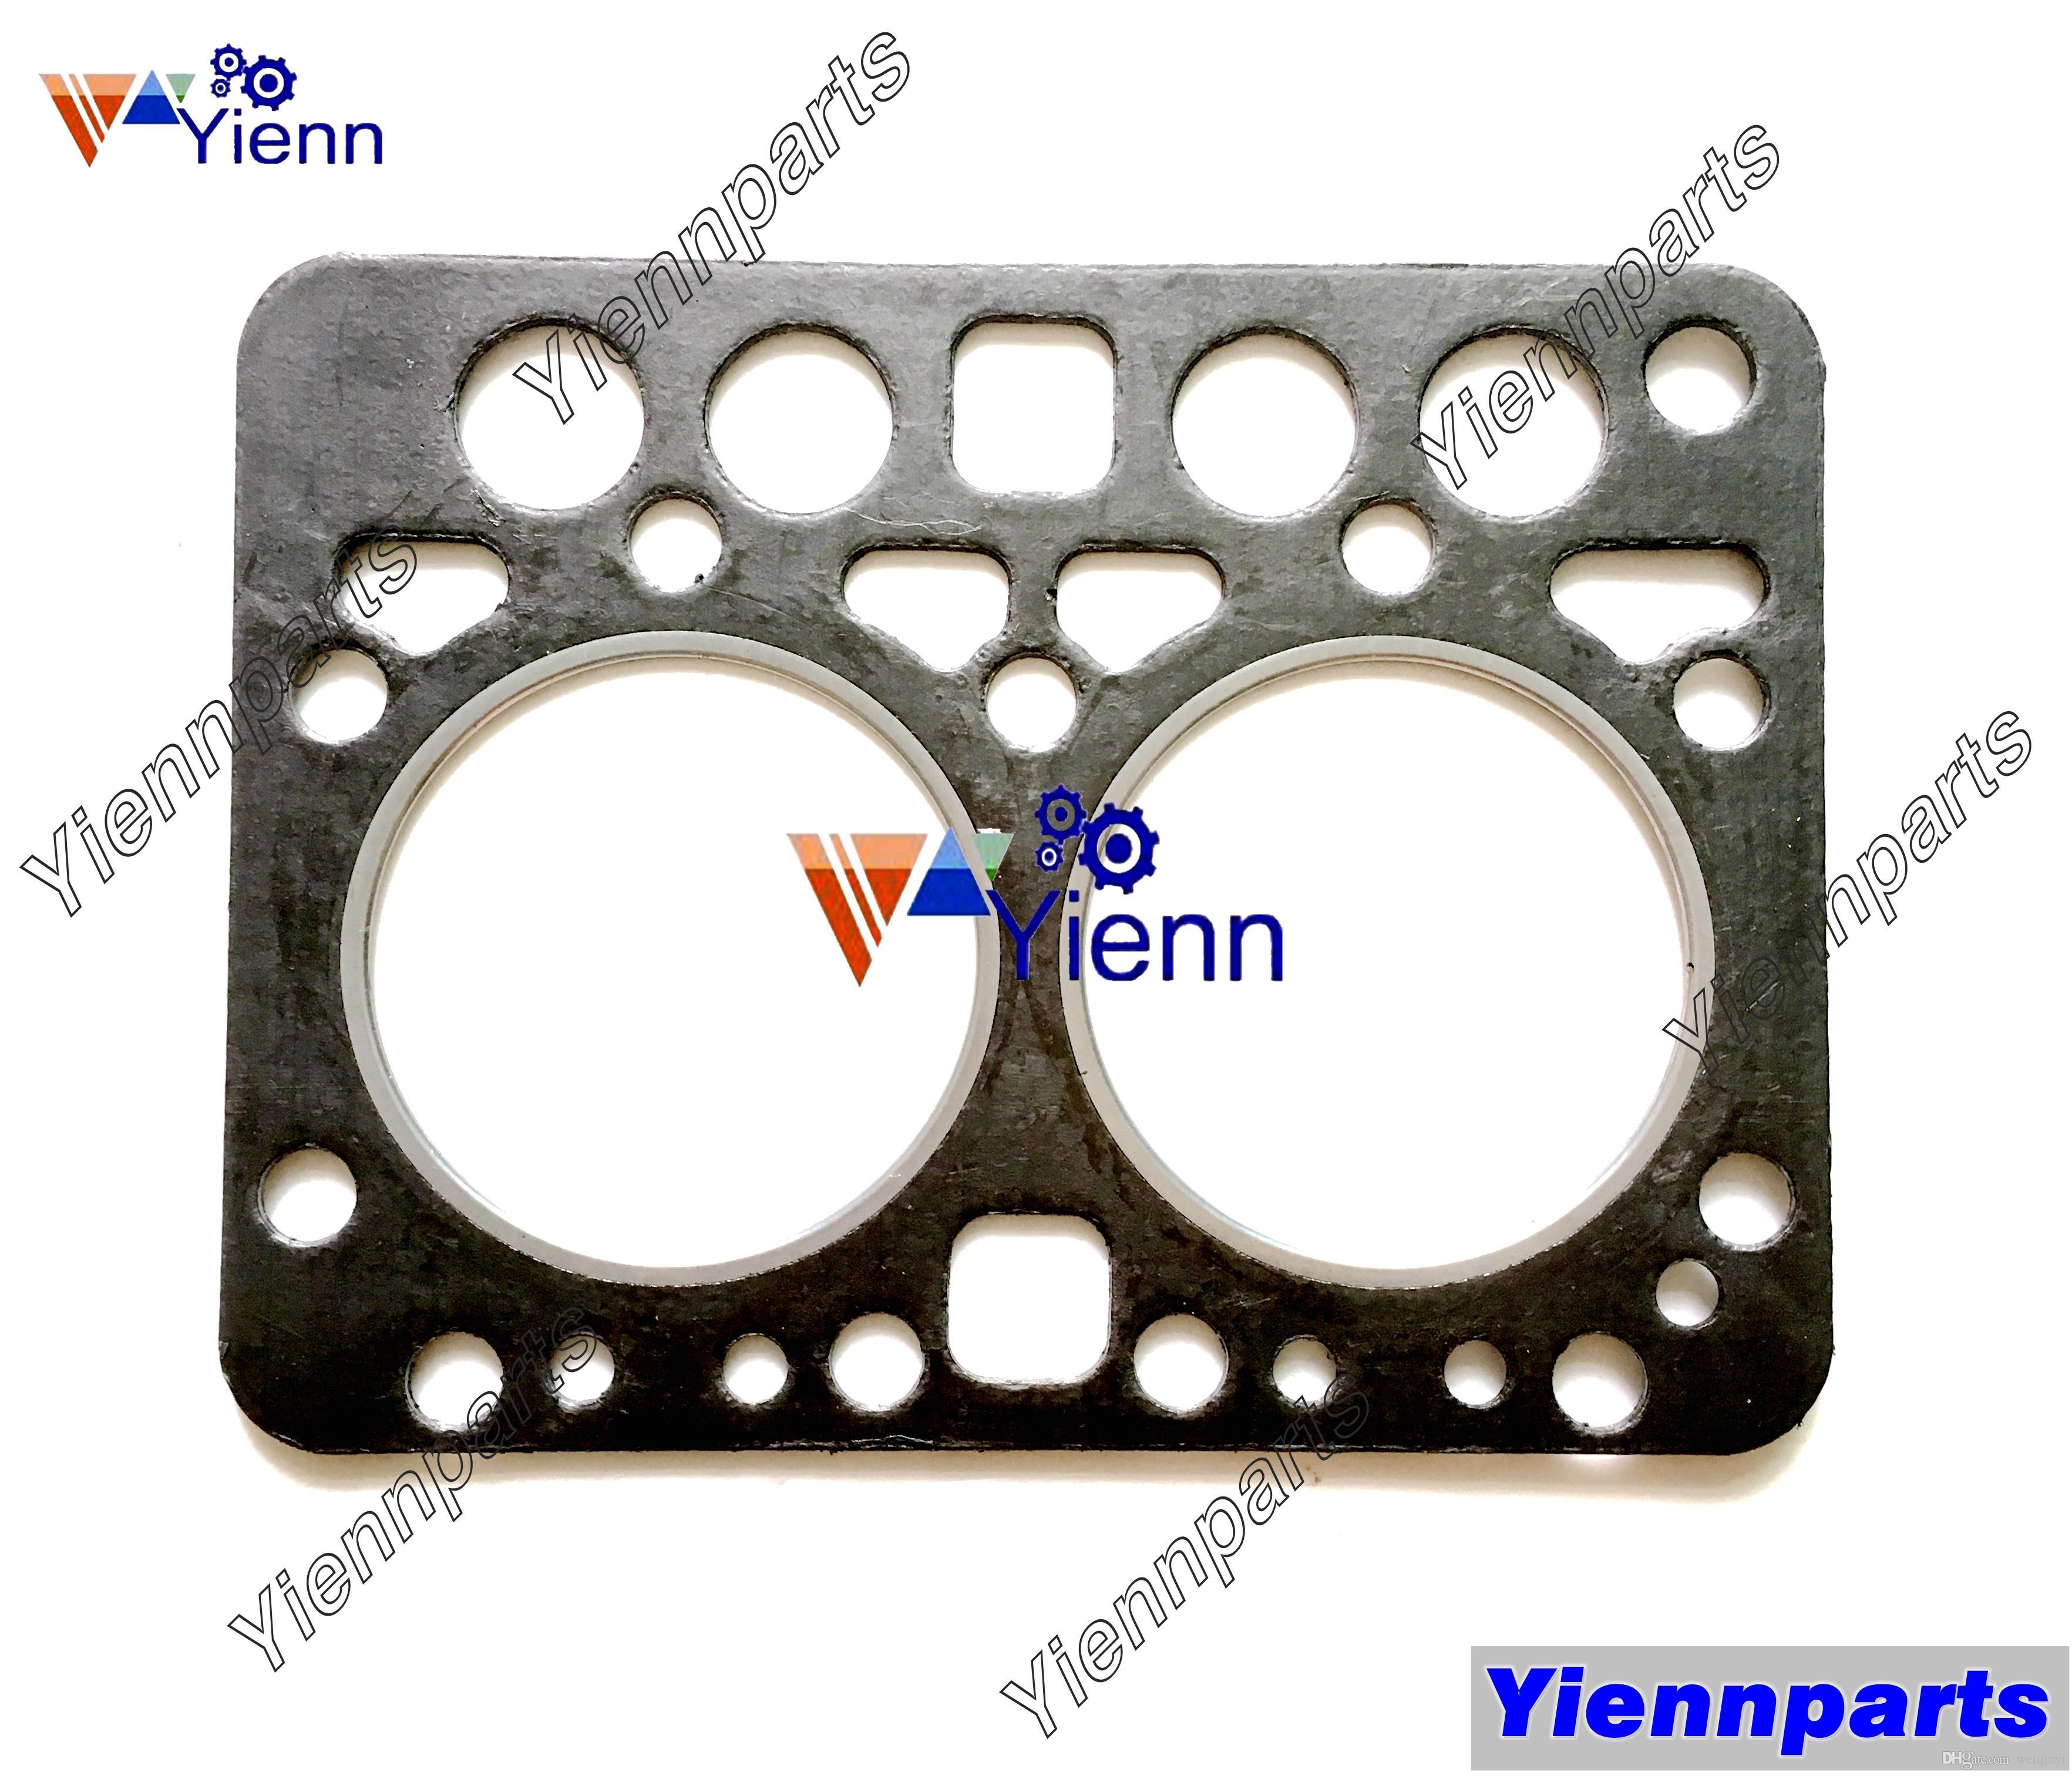 ZL600 Cylinder Head Gasket 15231-03312 For Kubota B6000 Tractor diesel  engine repair parts in good quality